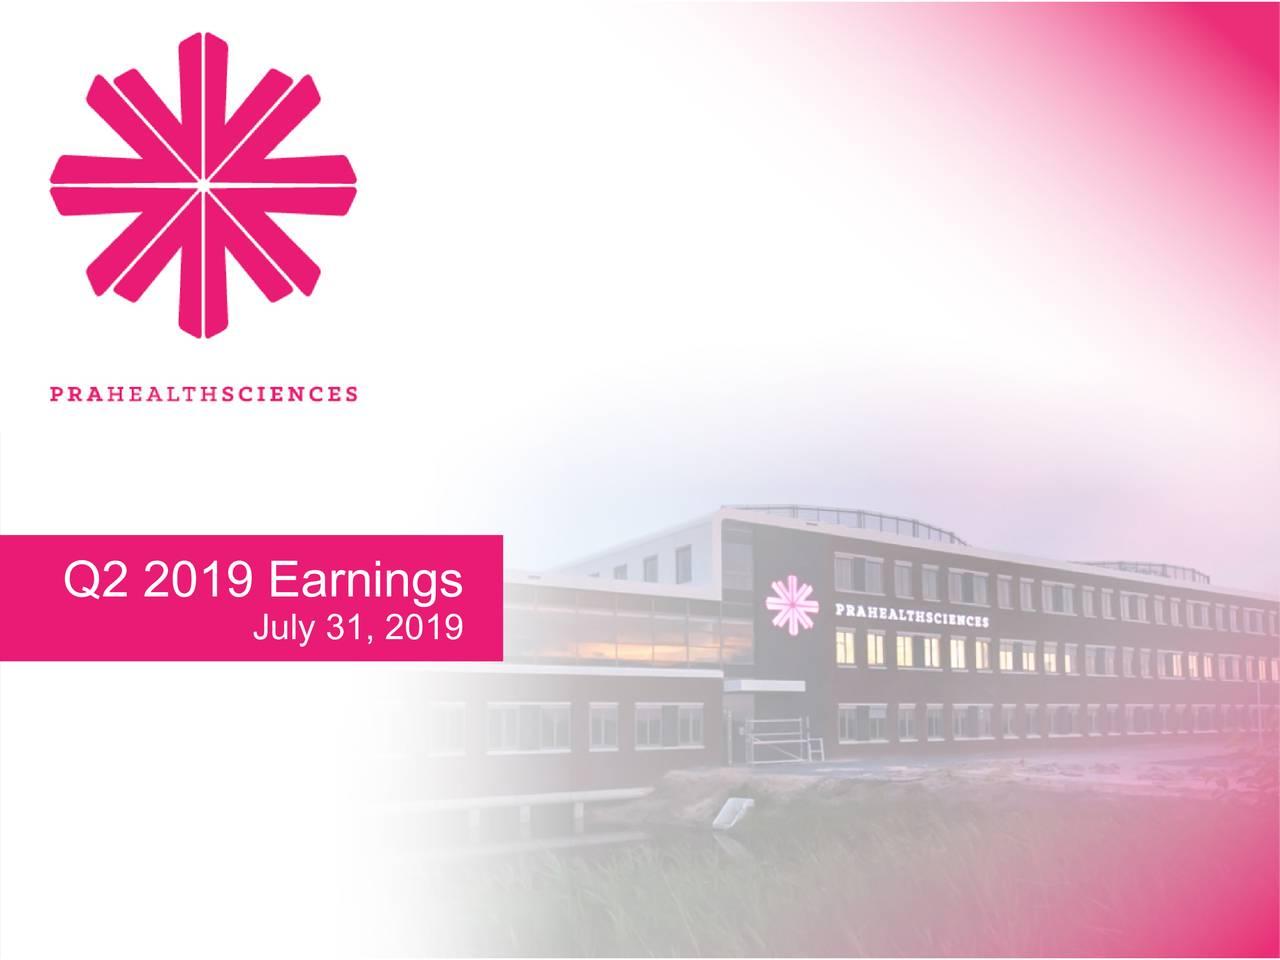 Q2 2019 Earnings